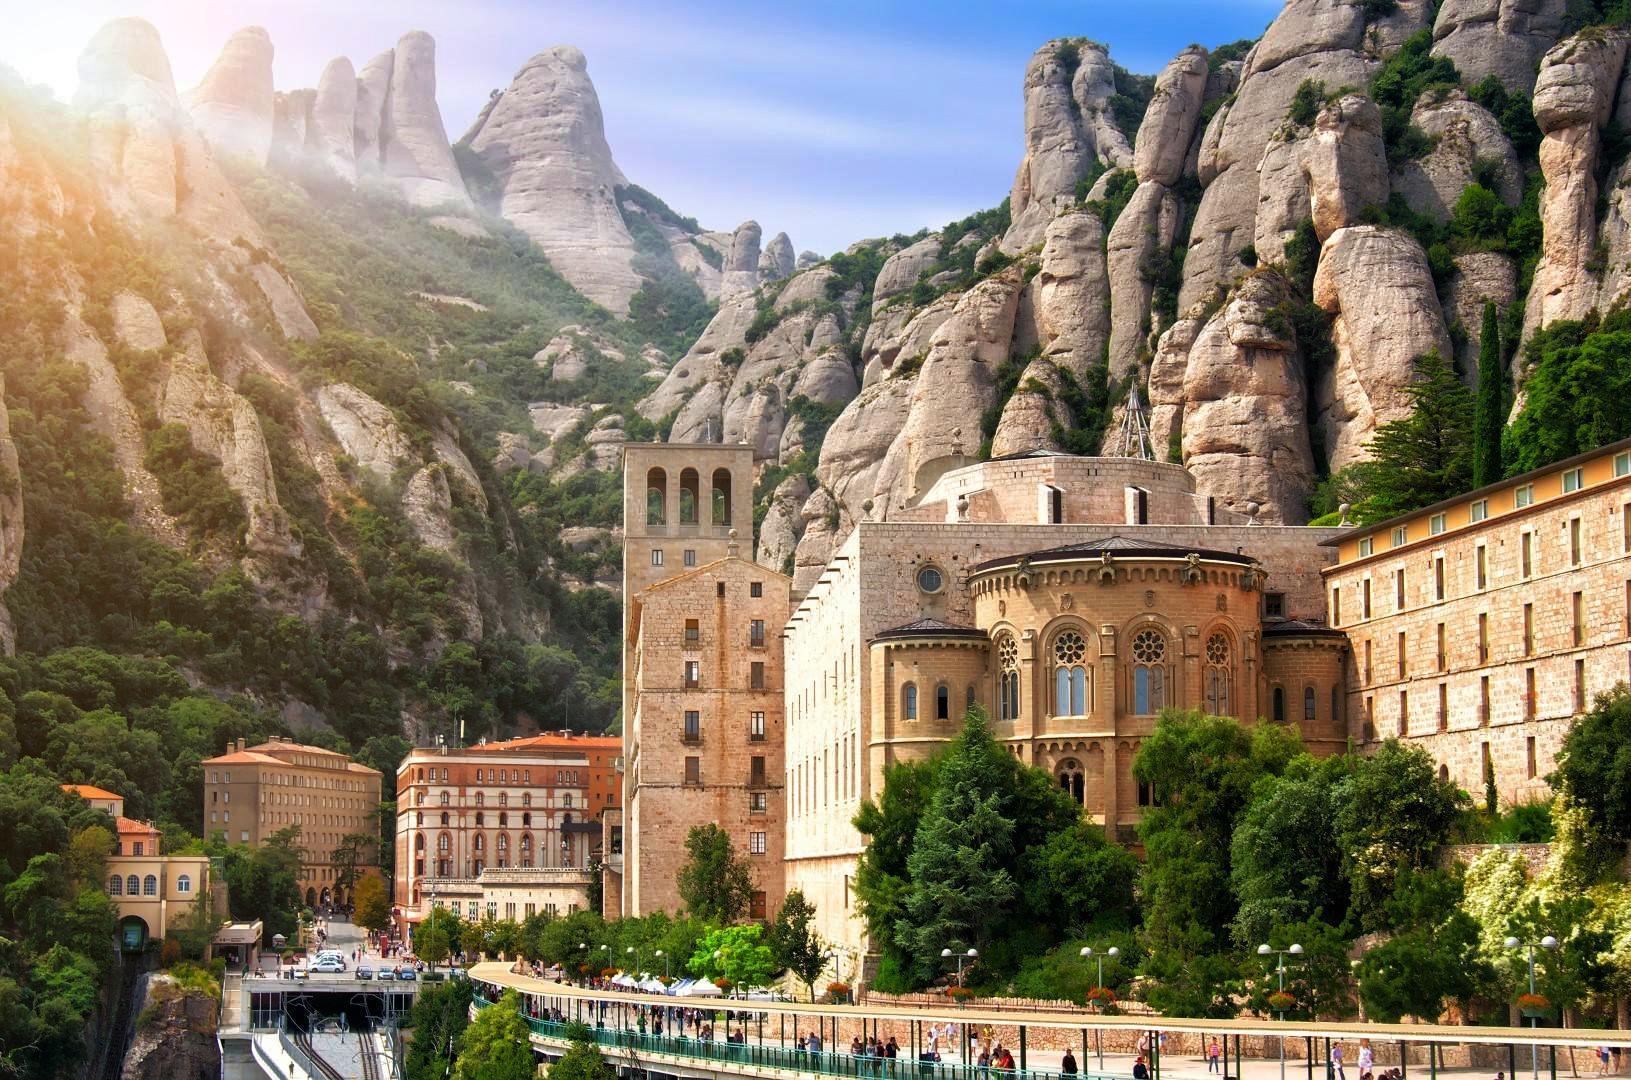 Dormire in paradiso: abbazie, monasteri, ashram… - Tgcom24